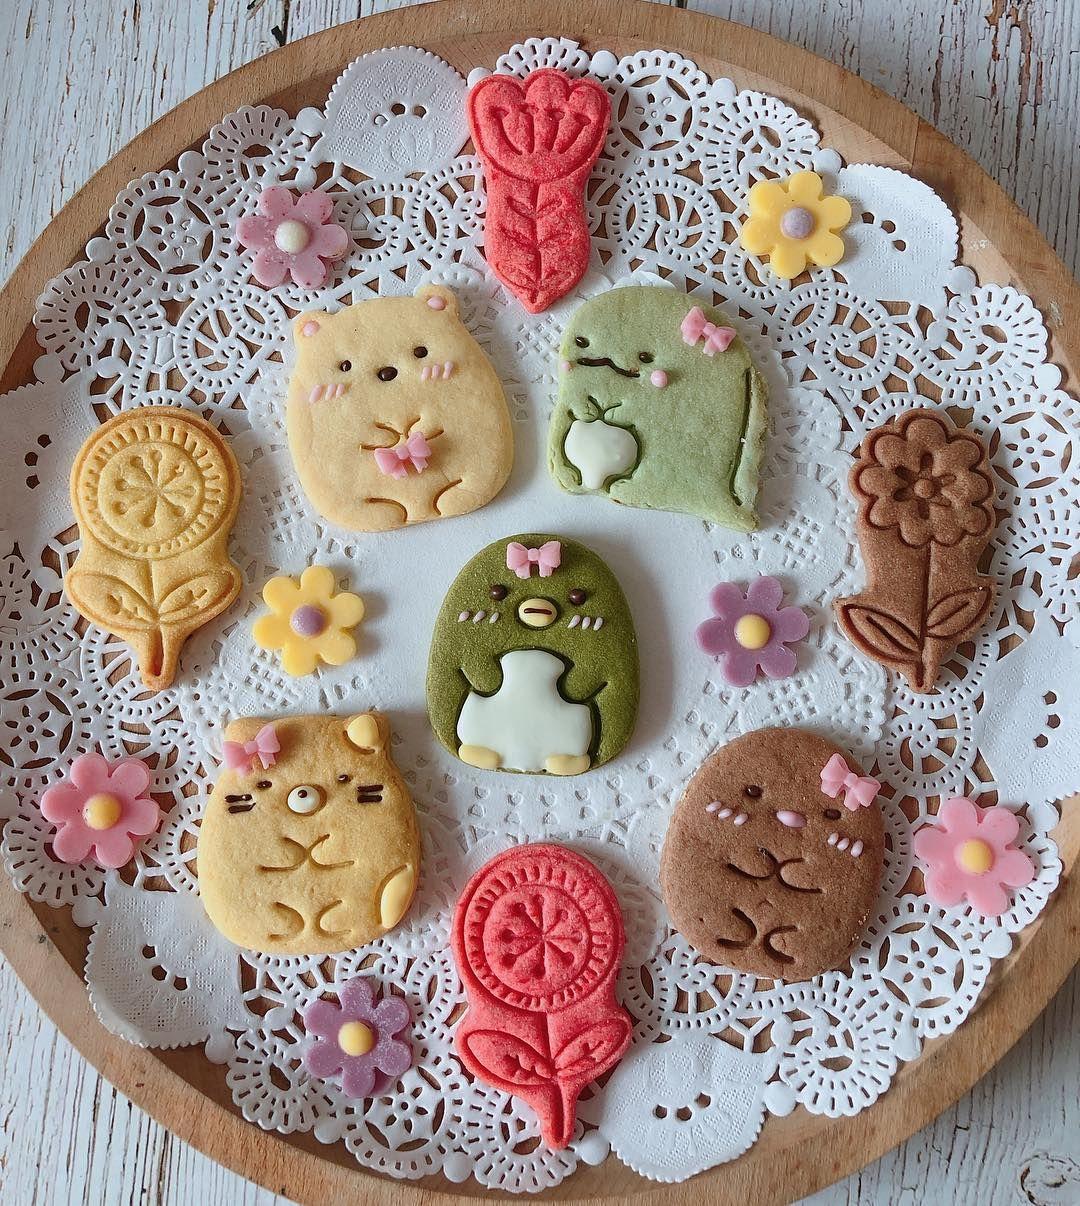 Amanda S Homemadeさんはinstagramを利用しています 參加party的角落 戴上蝴蝶結 超可愛的 Sumikkogurashi Cookies Party Bow Kawaiifood Cutefood クッキー クッキー缶 手作りケーキ 2020 春のお菓子 カワイイデザート 手作りケーキ